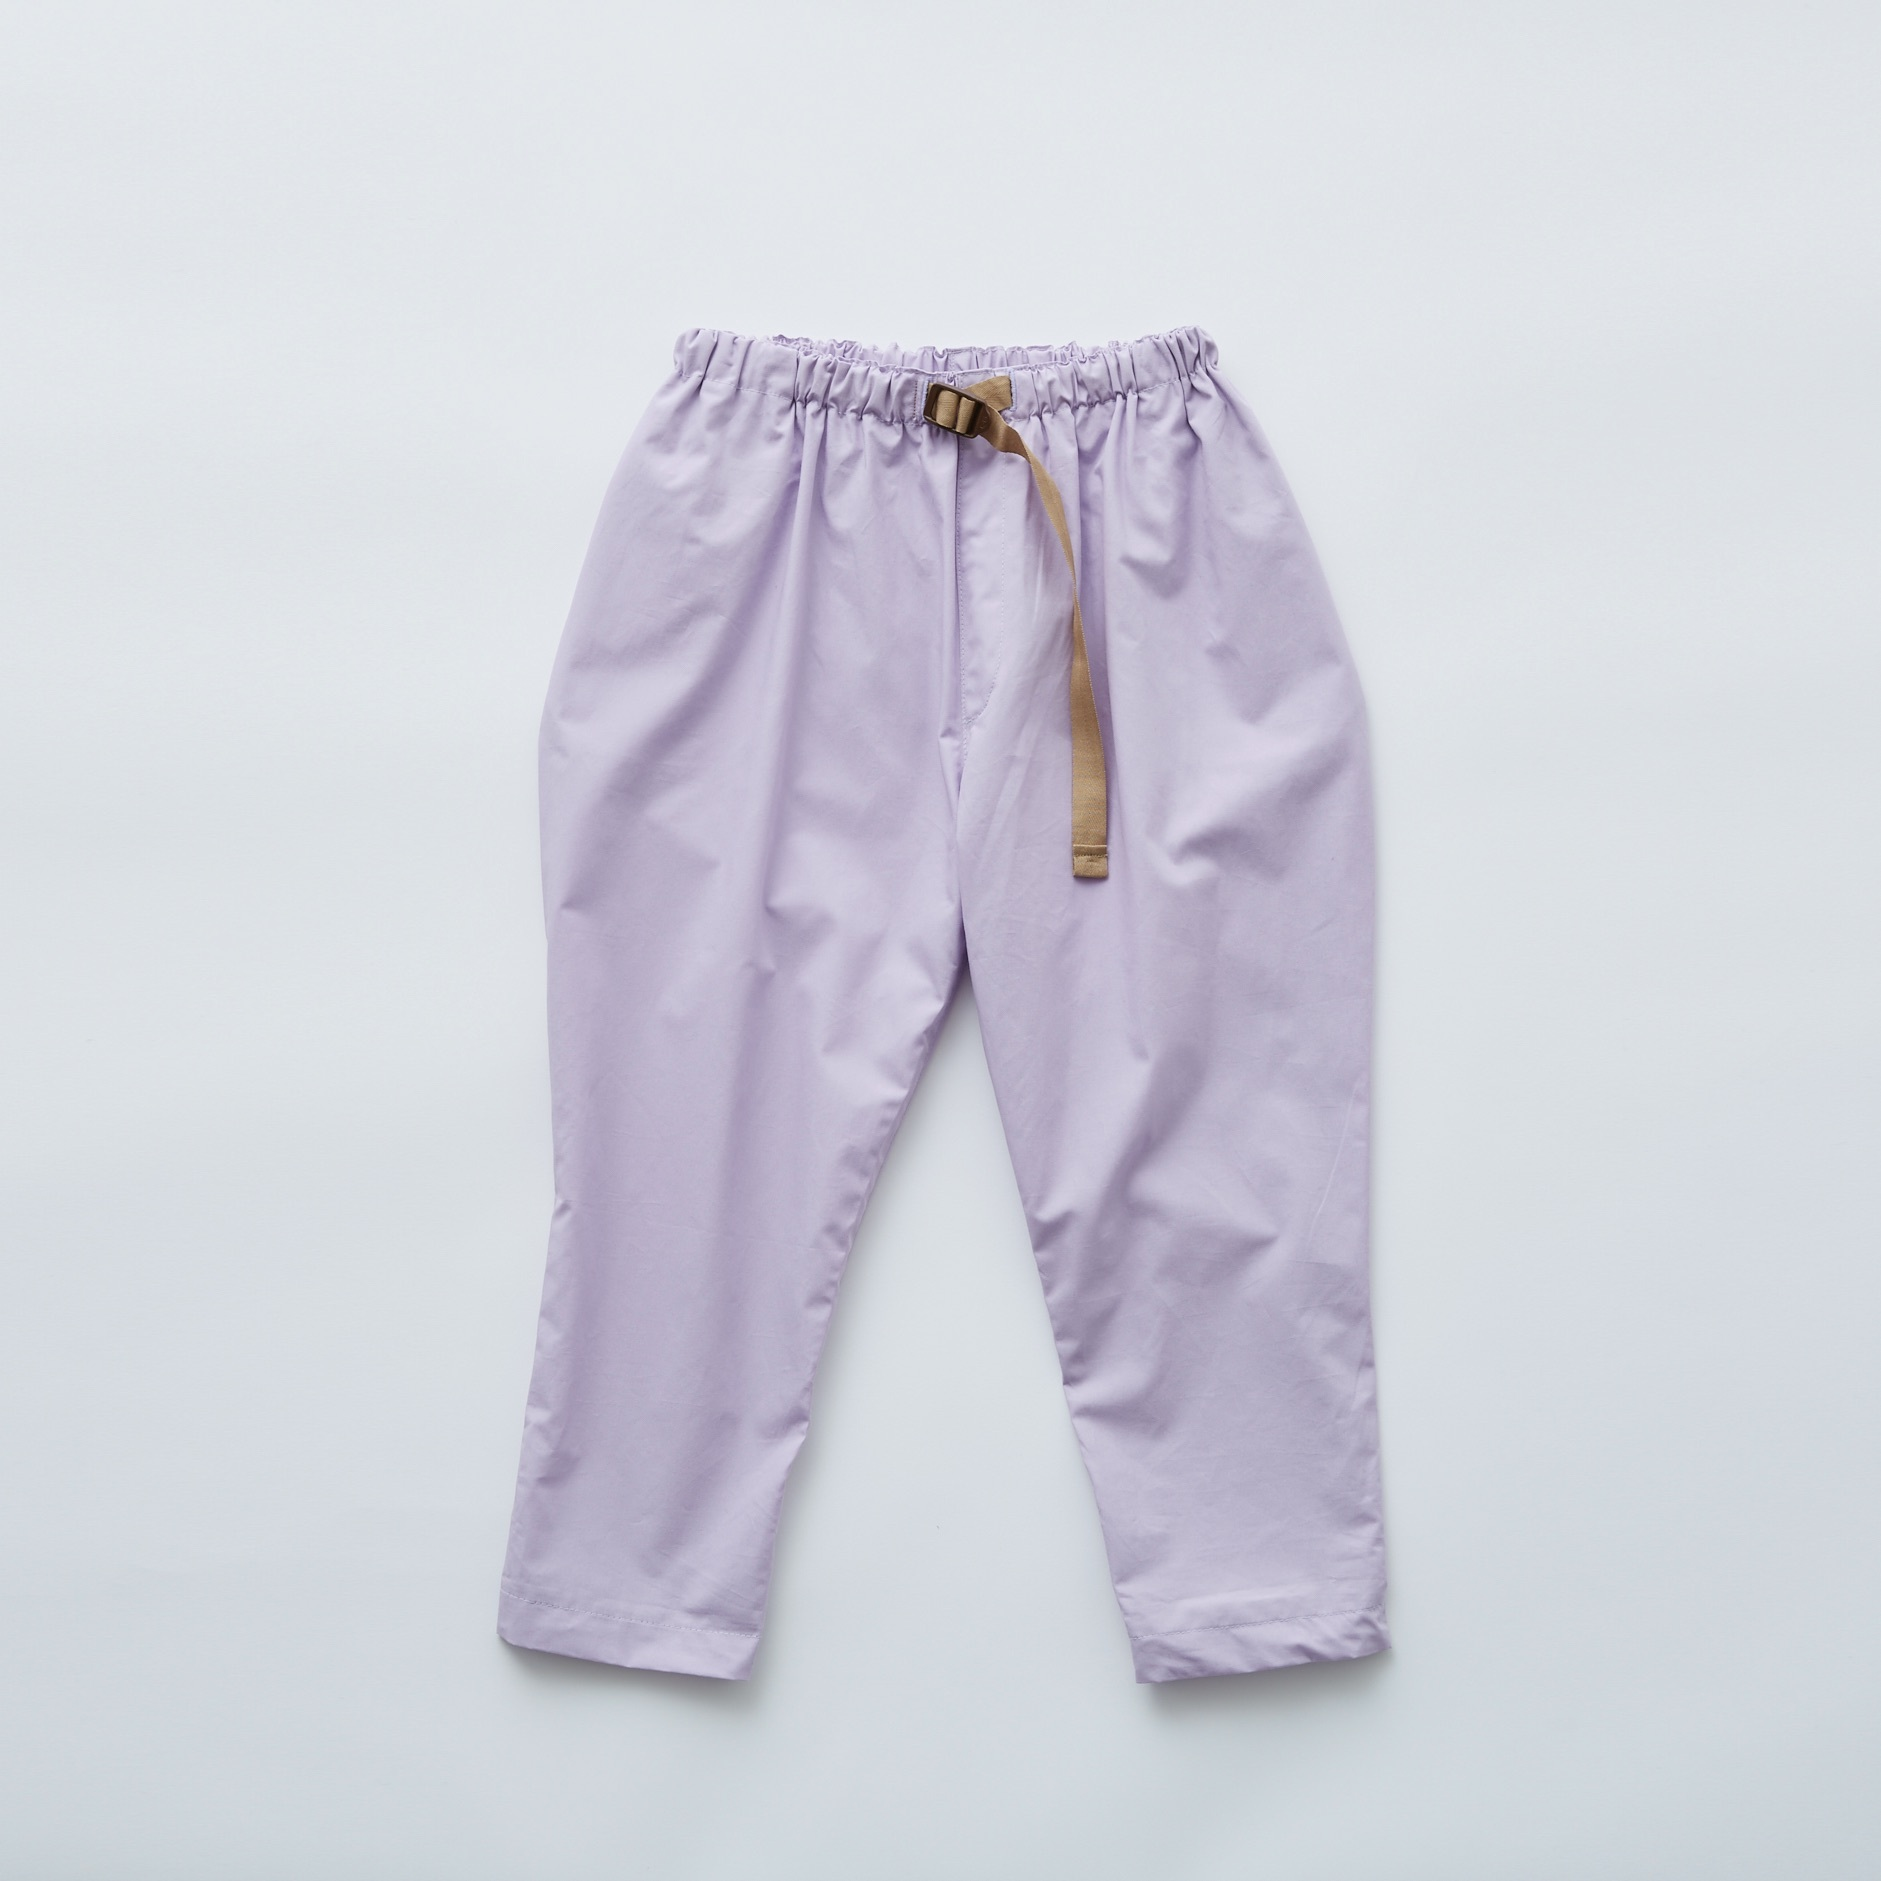 《eLfinFolk 2021SS》typwriter pants / lavender / 140-150cm